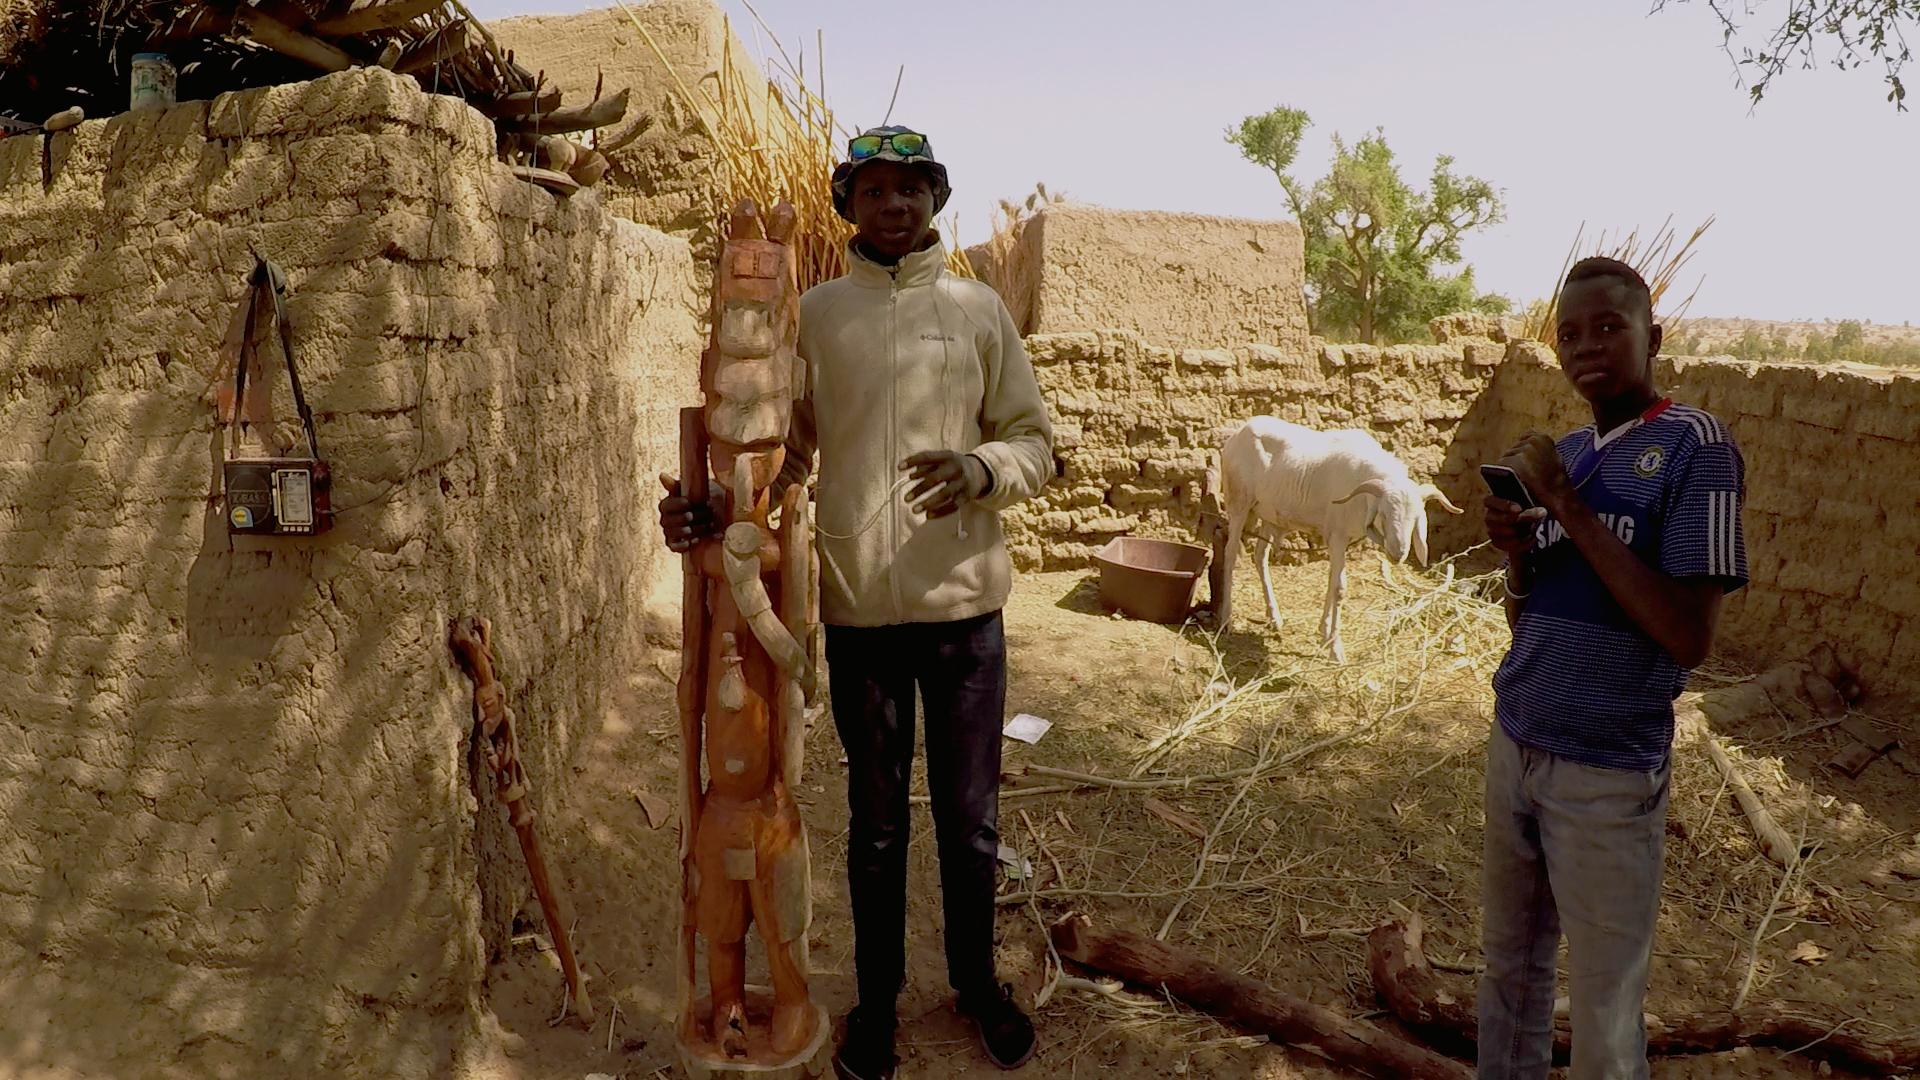 herrero dogon mali pablocaminante ebanistas - Malí 8, País Dogon V: moda, arte y religión